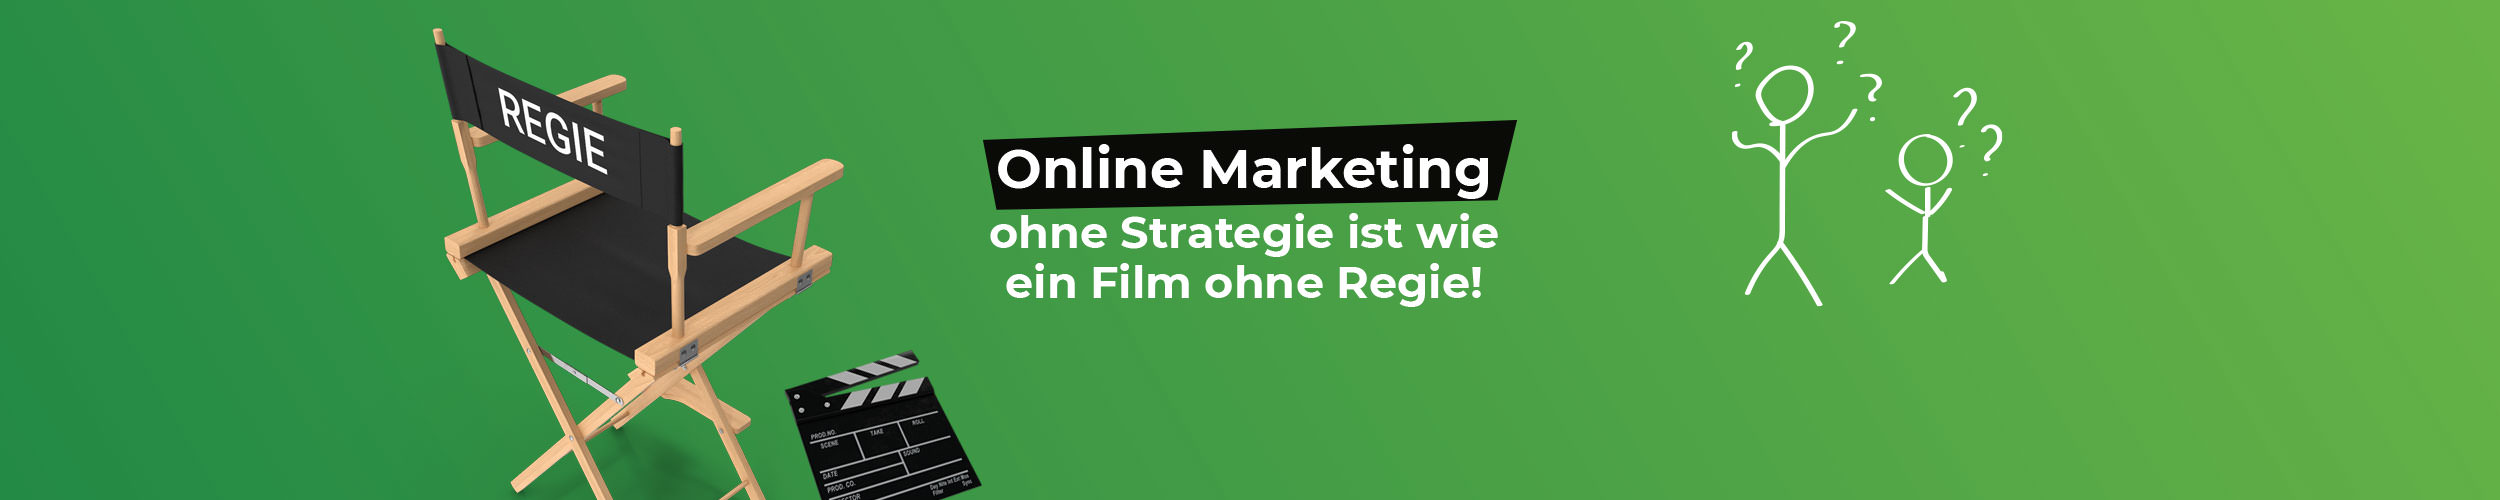 Online Marketing - purpix GmbH